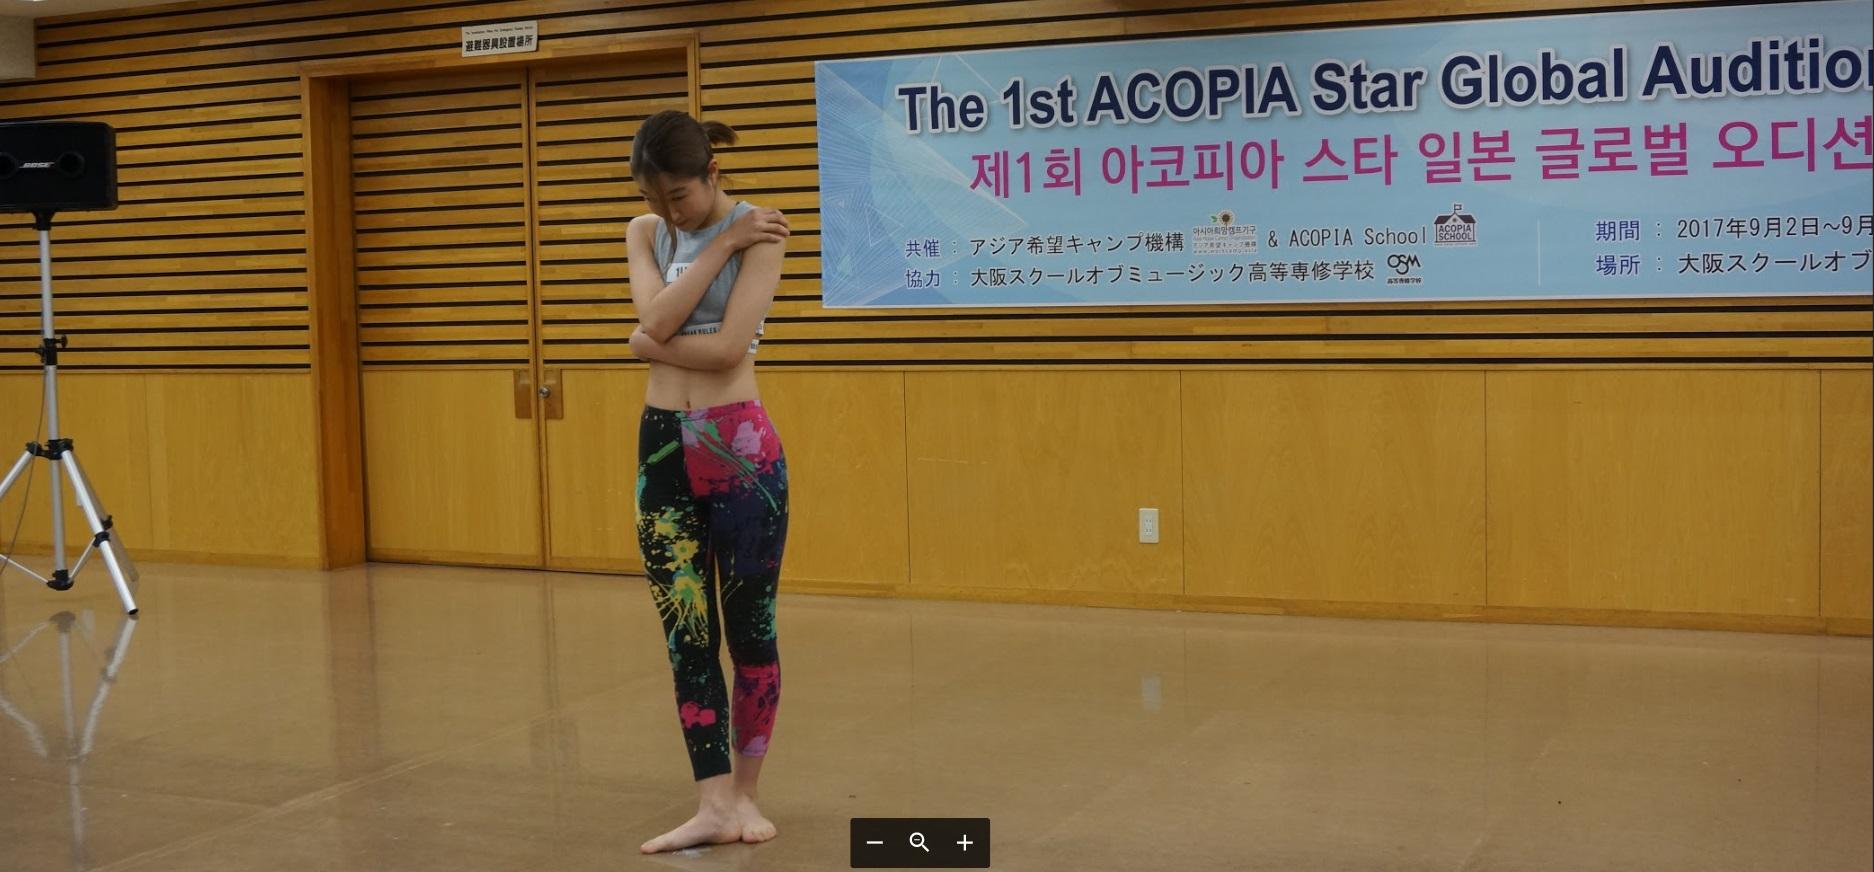 Global Audition (GA) - KPOP SCHOOL